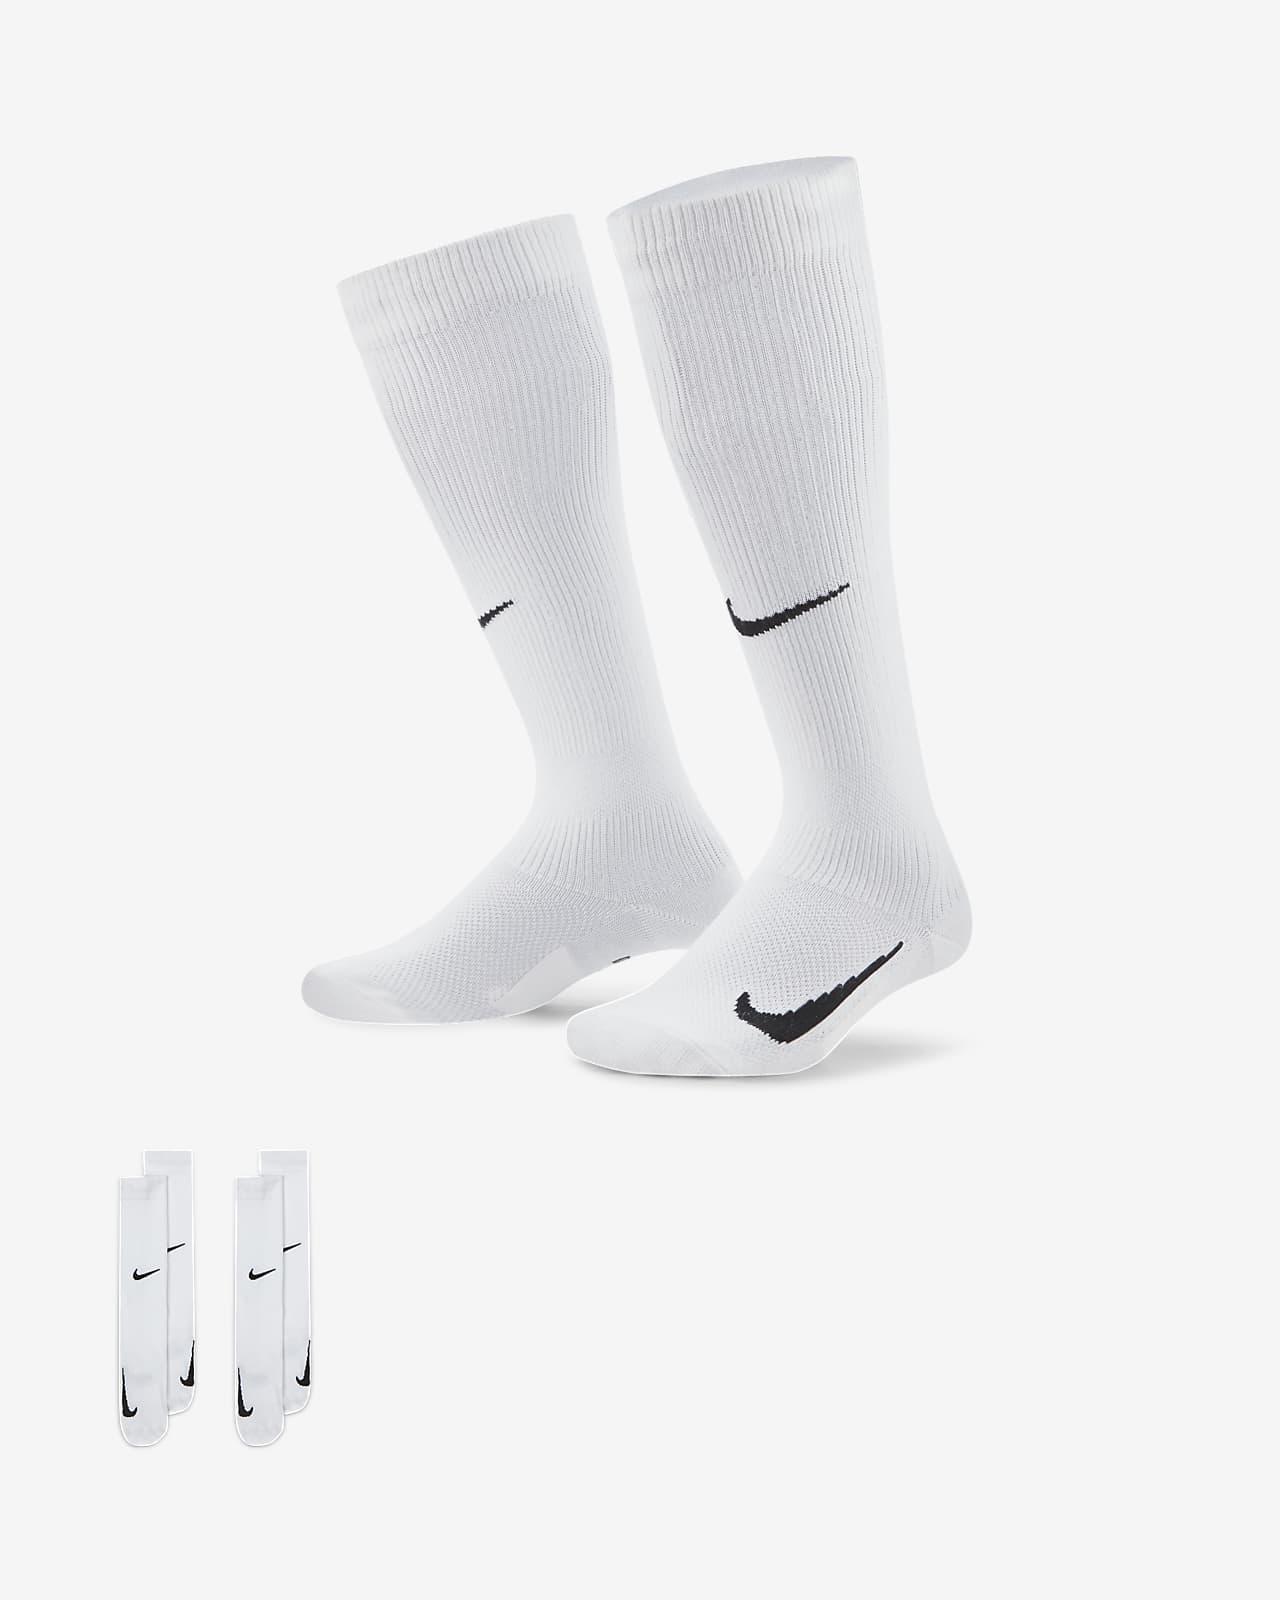 Nike Swoosh Kids' Over-the-Calf Socks (2 Pairs)